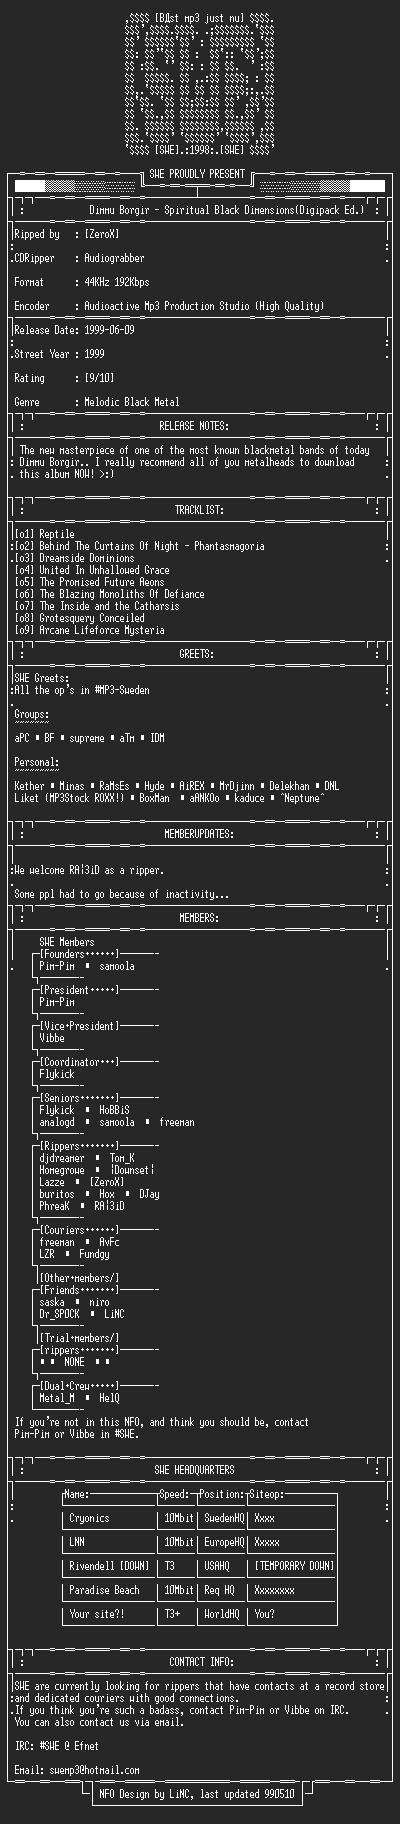 NFO file for Dimmu_Borgir_-_Spritual_Black_Dimensions-1999-SWE